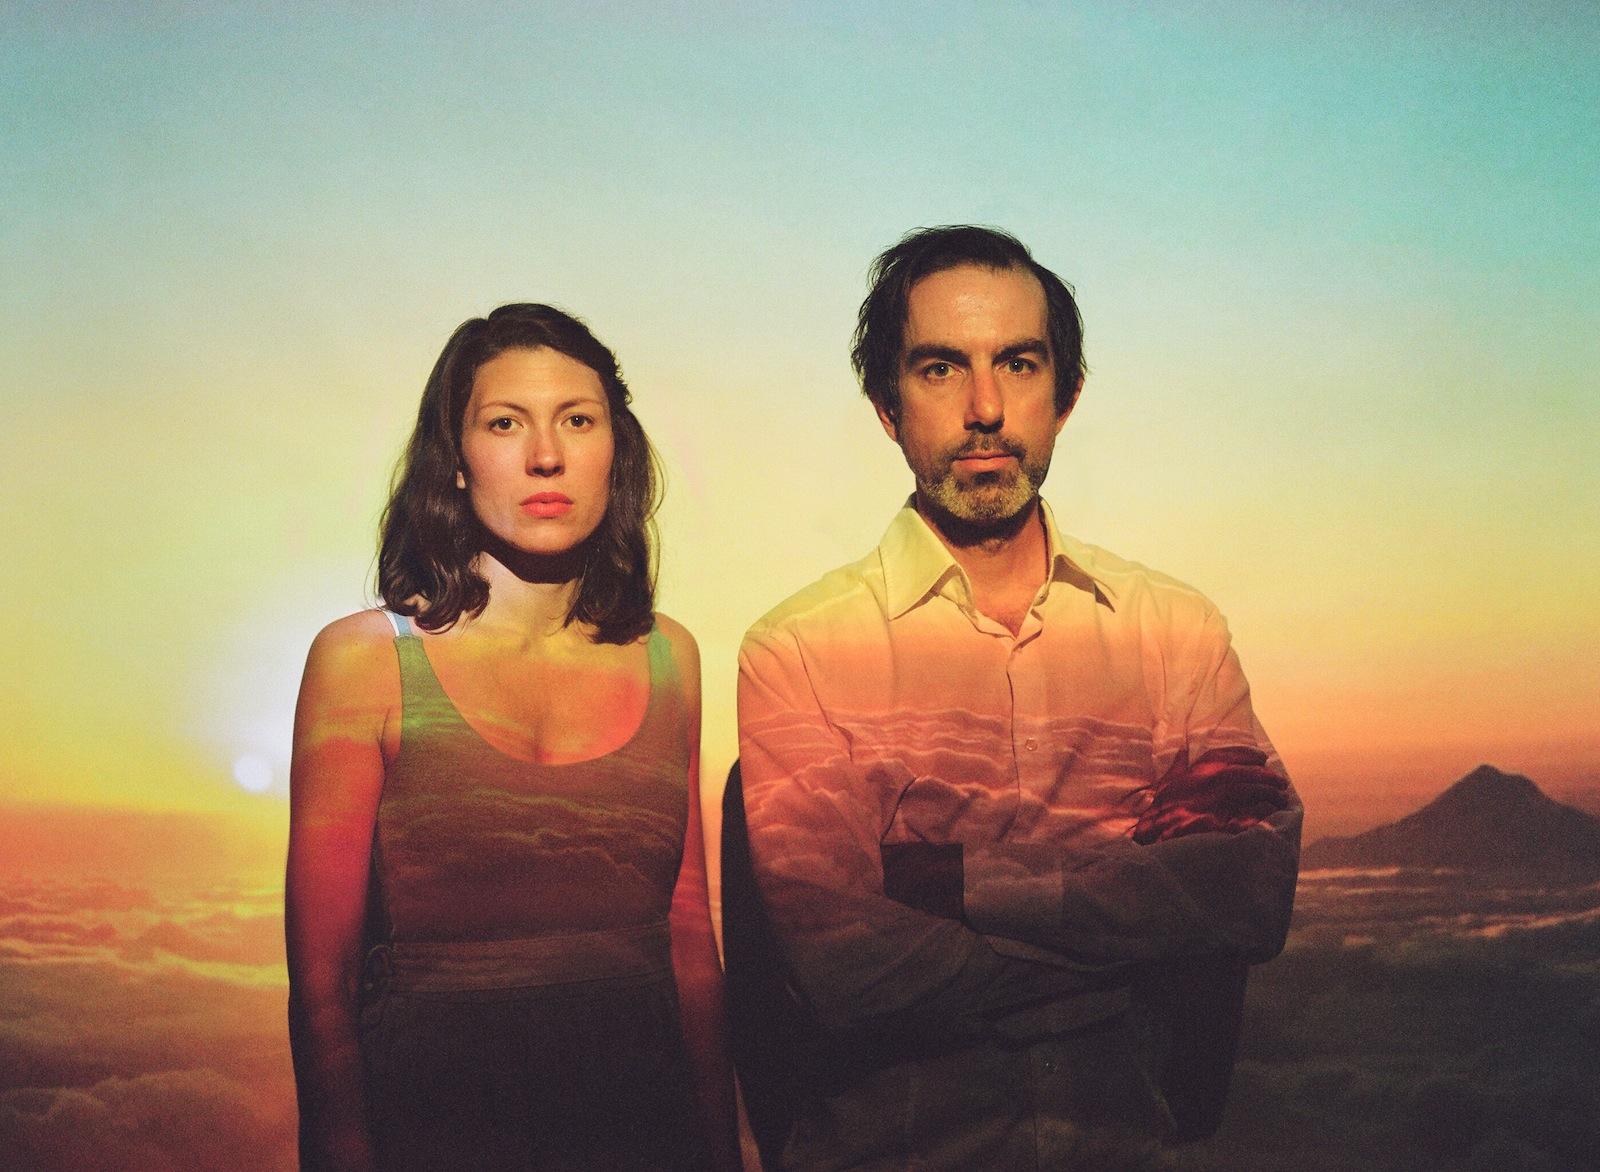 Exklusiv bei uns: 'Shapeless' von Alela Diane & Ryan Fracesconi